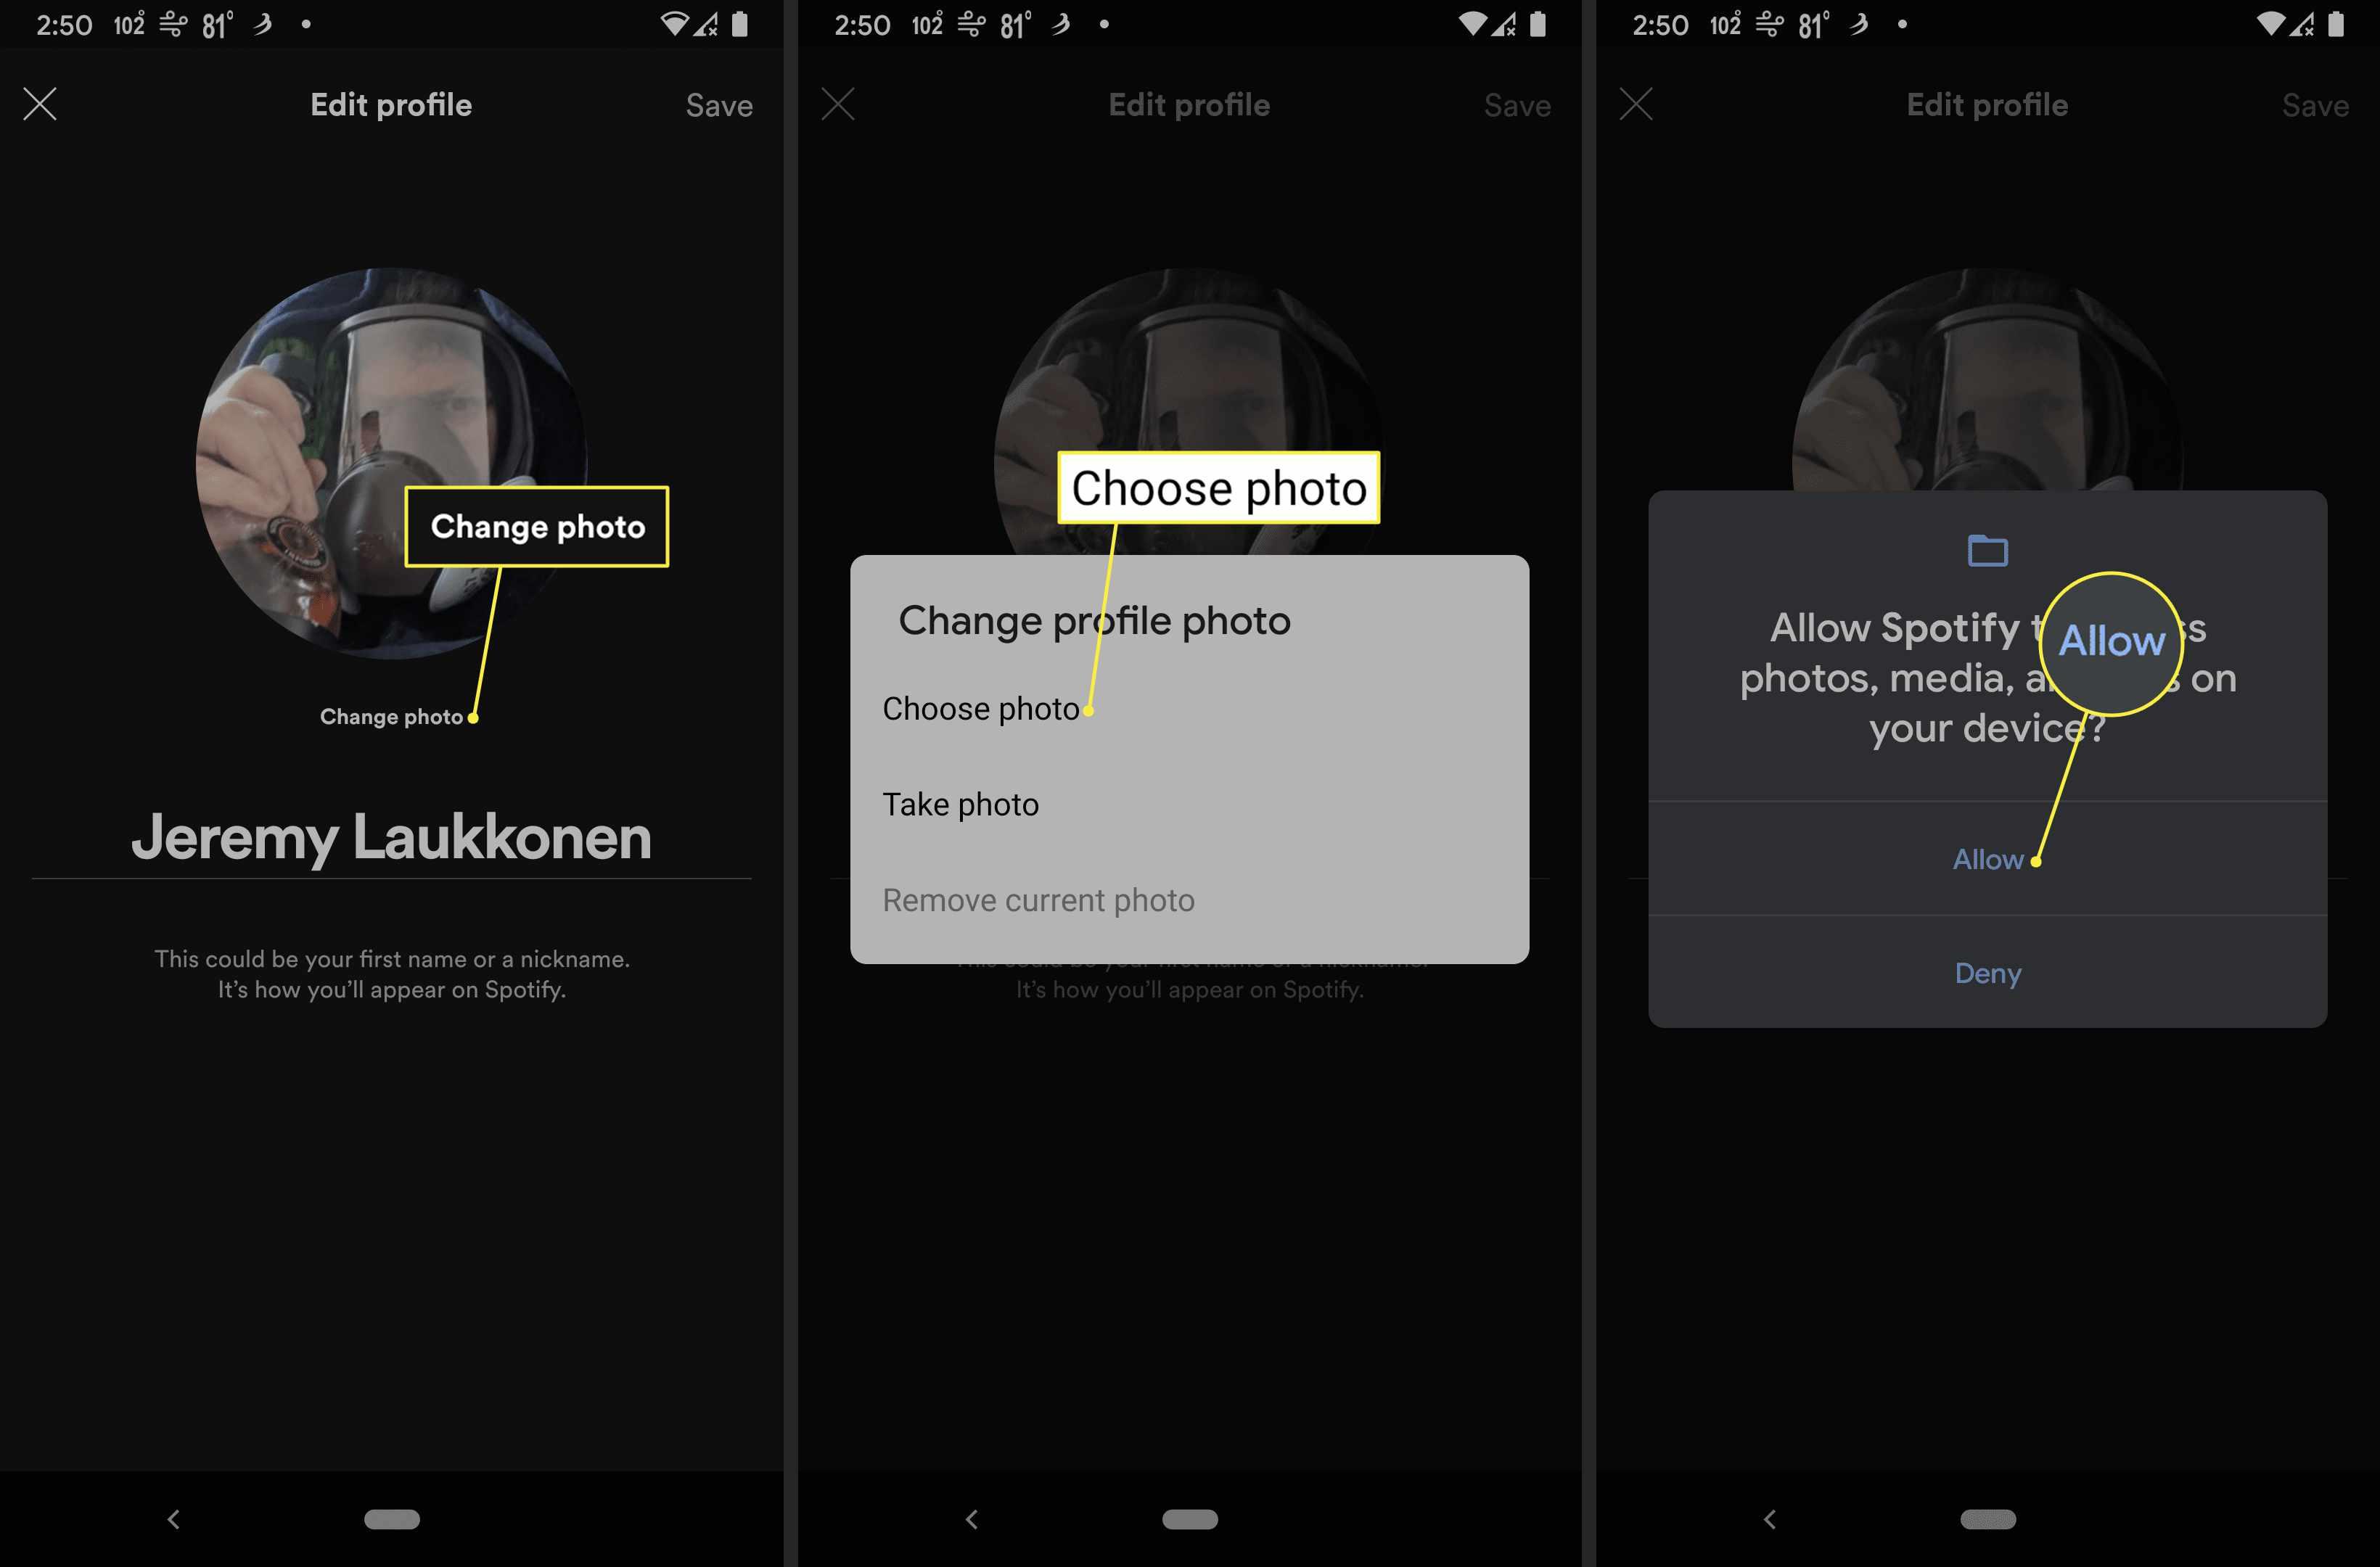 Change photo, Choose photo, Allow in Spotify app